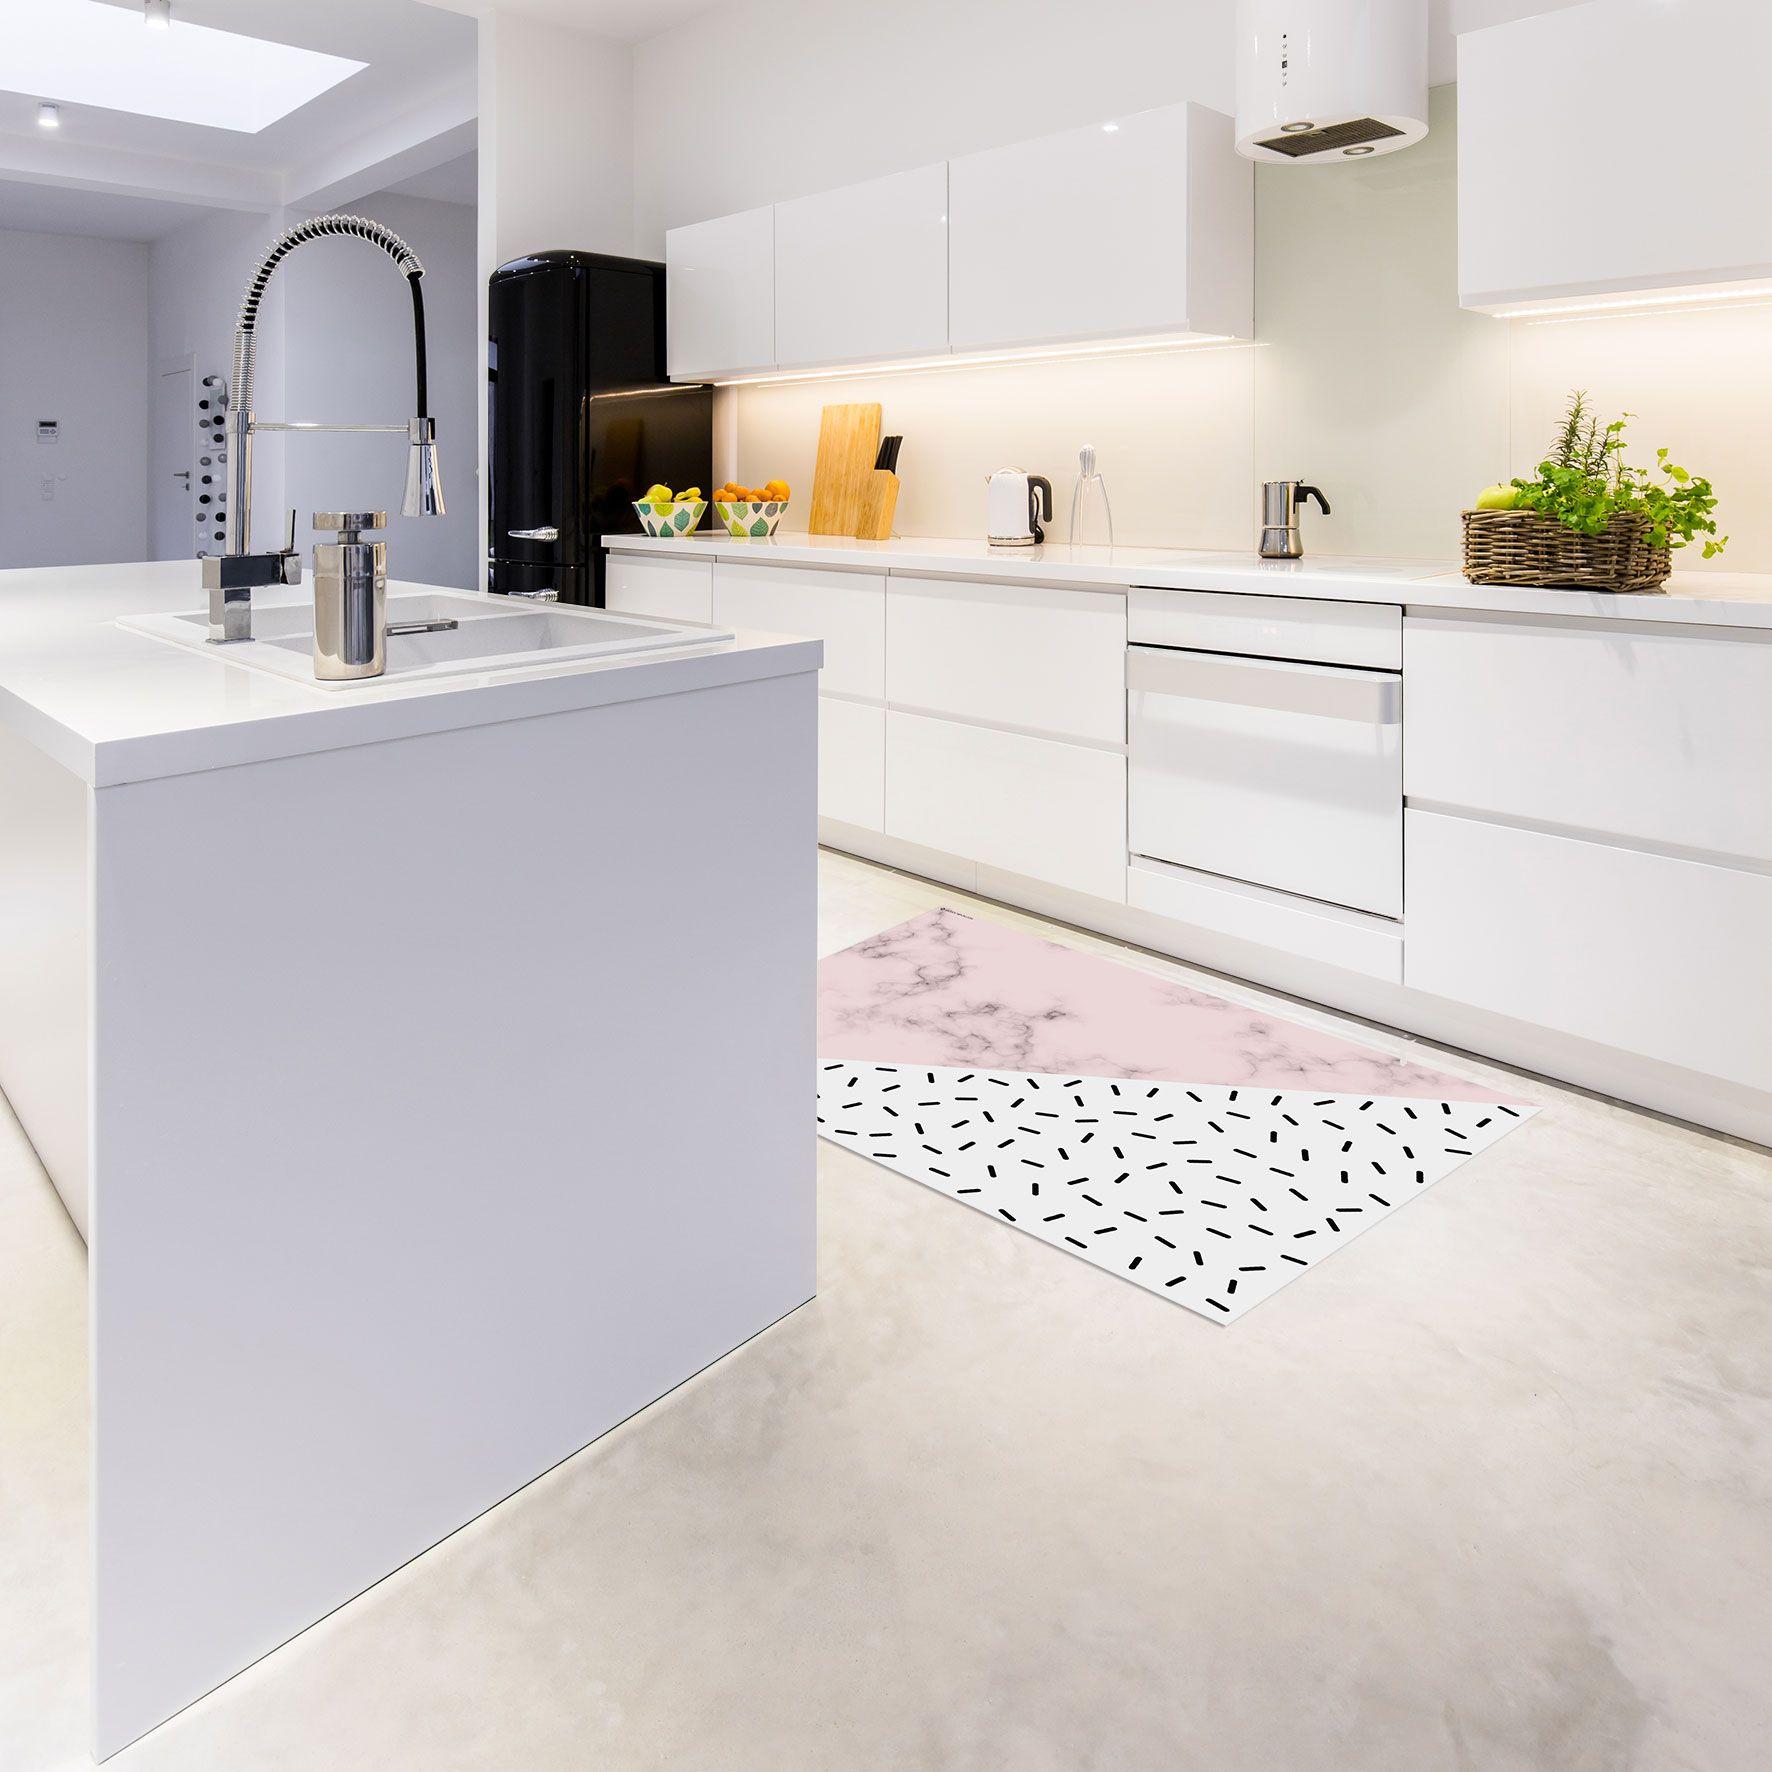 Download Wallpaper White Kitchen Area Rug